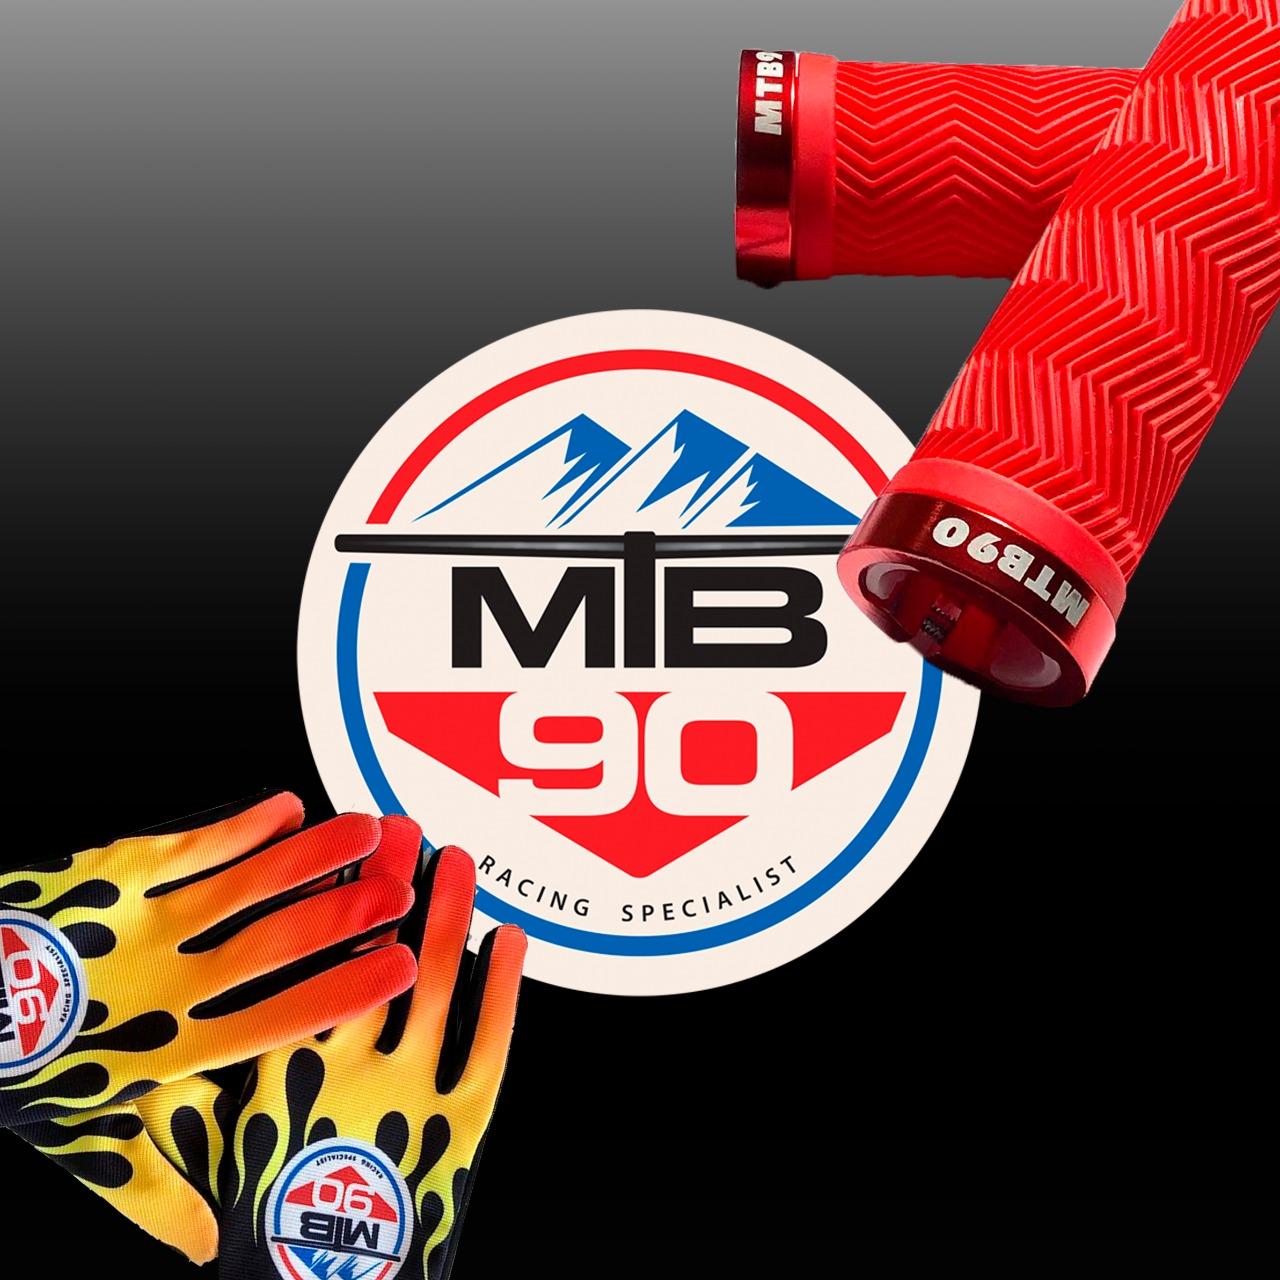 MTB 90